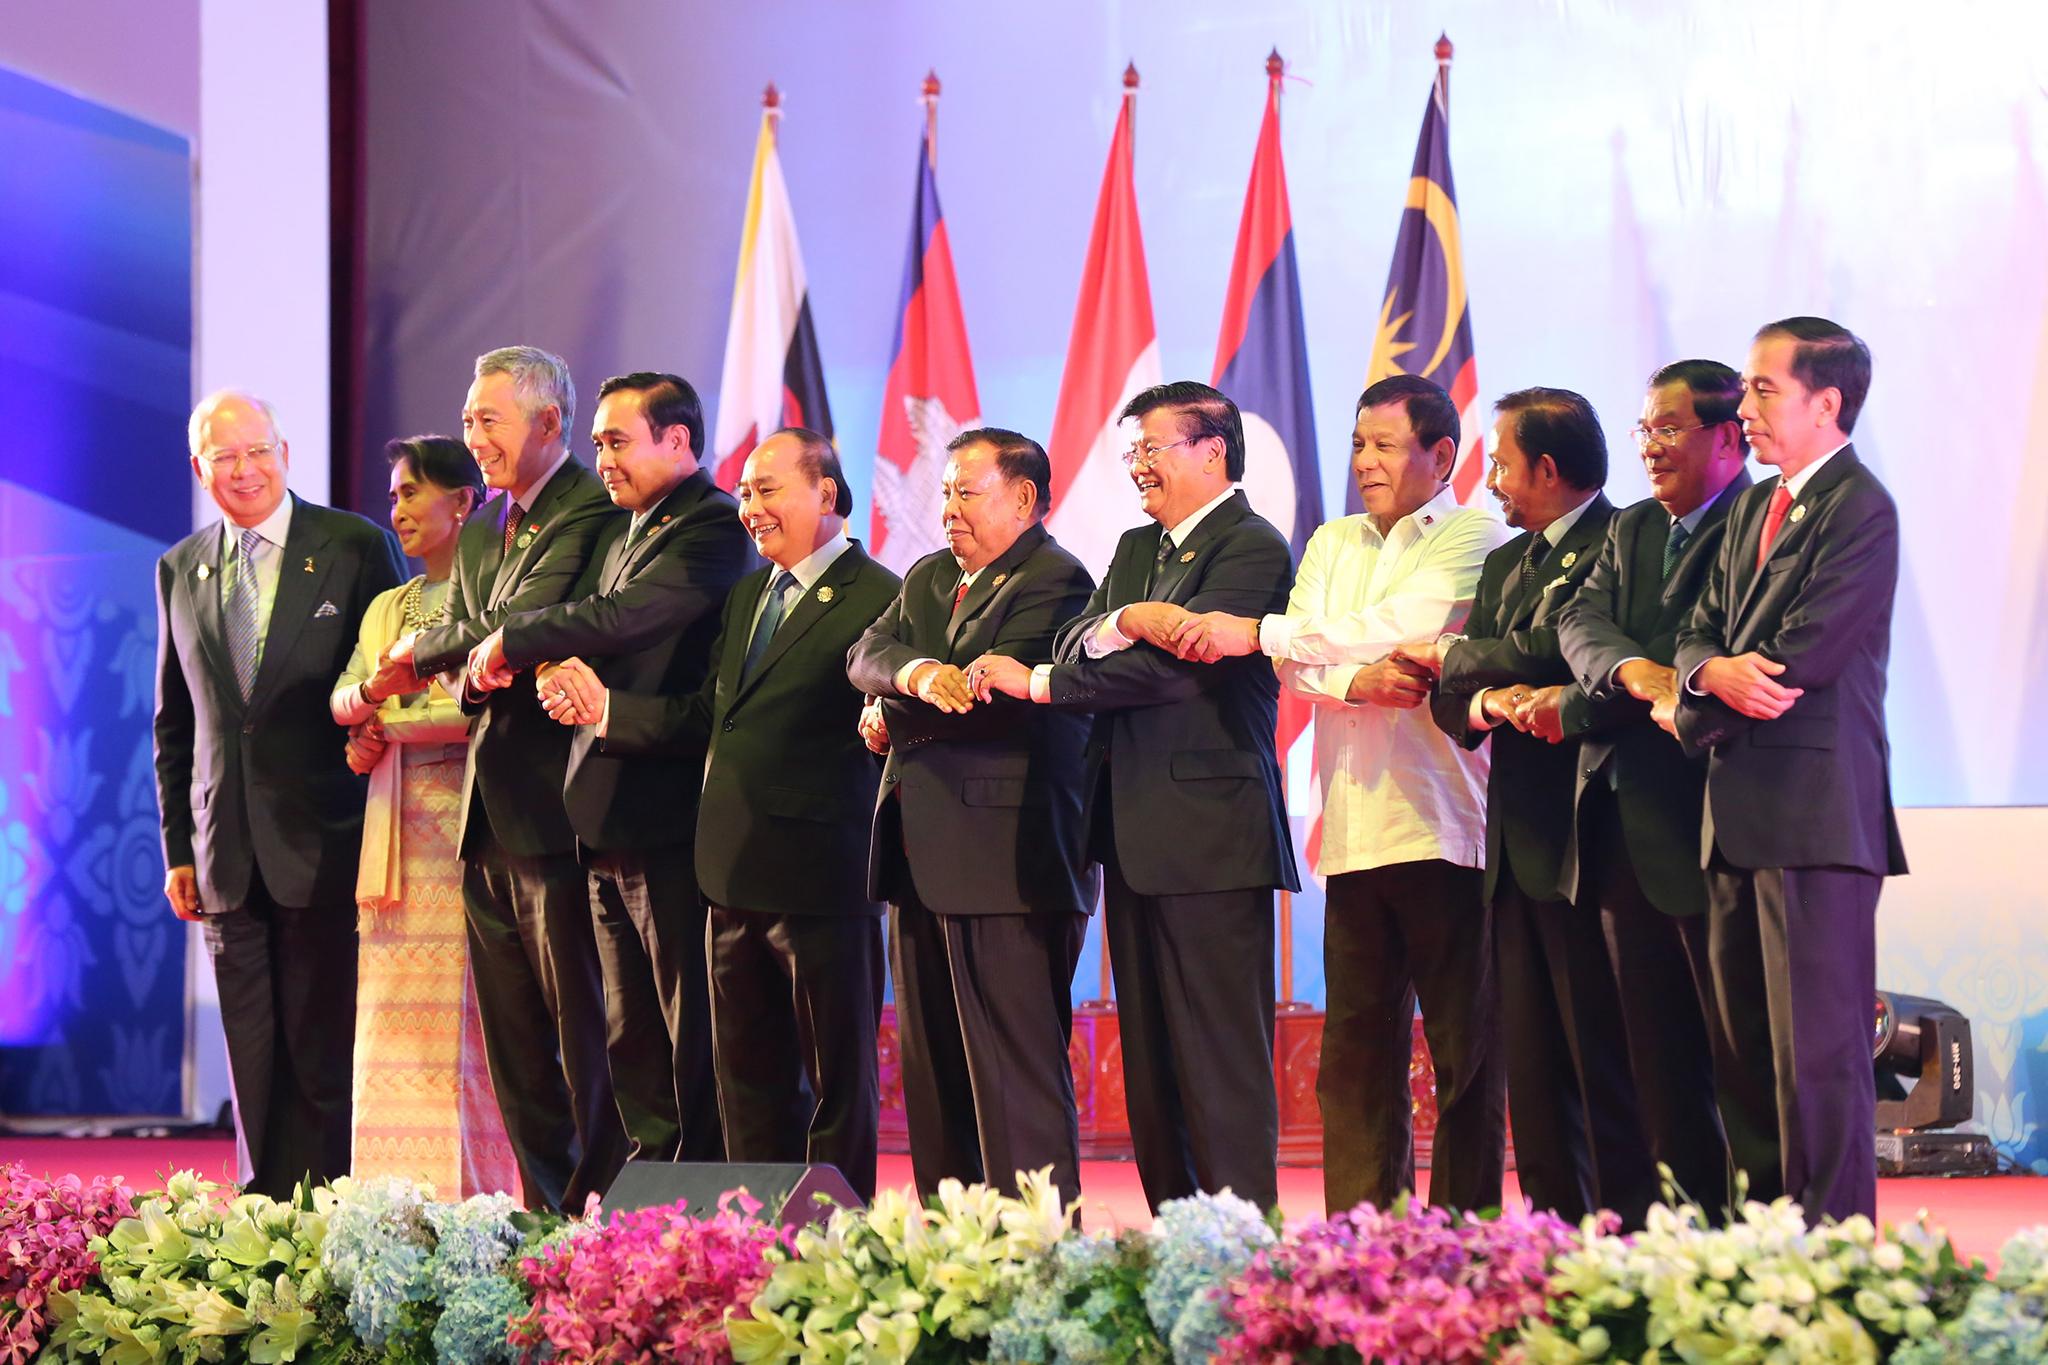 ASEAN evita críticas a Pequim sobre mar do Sul